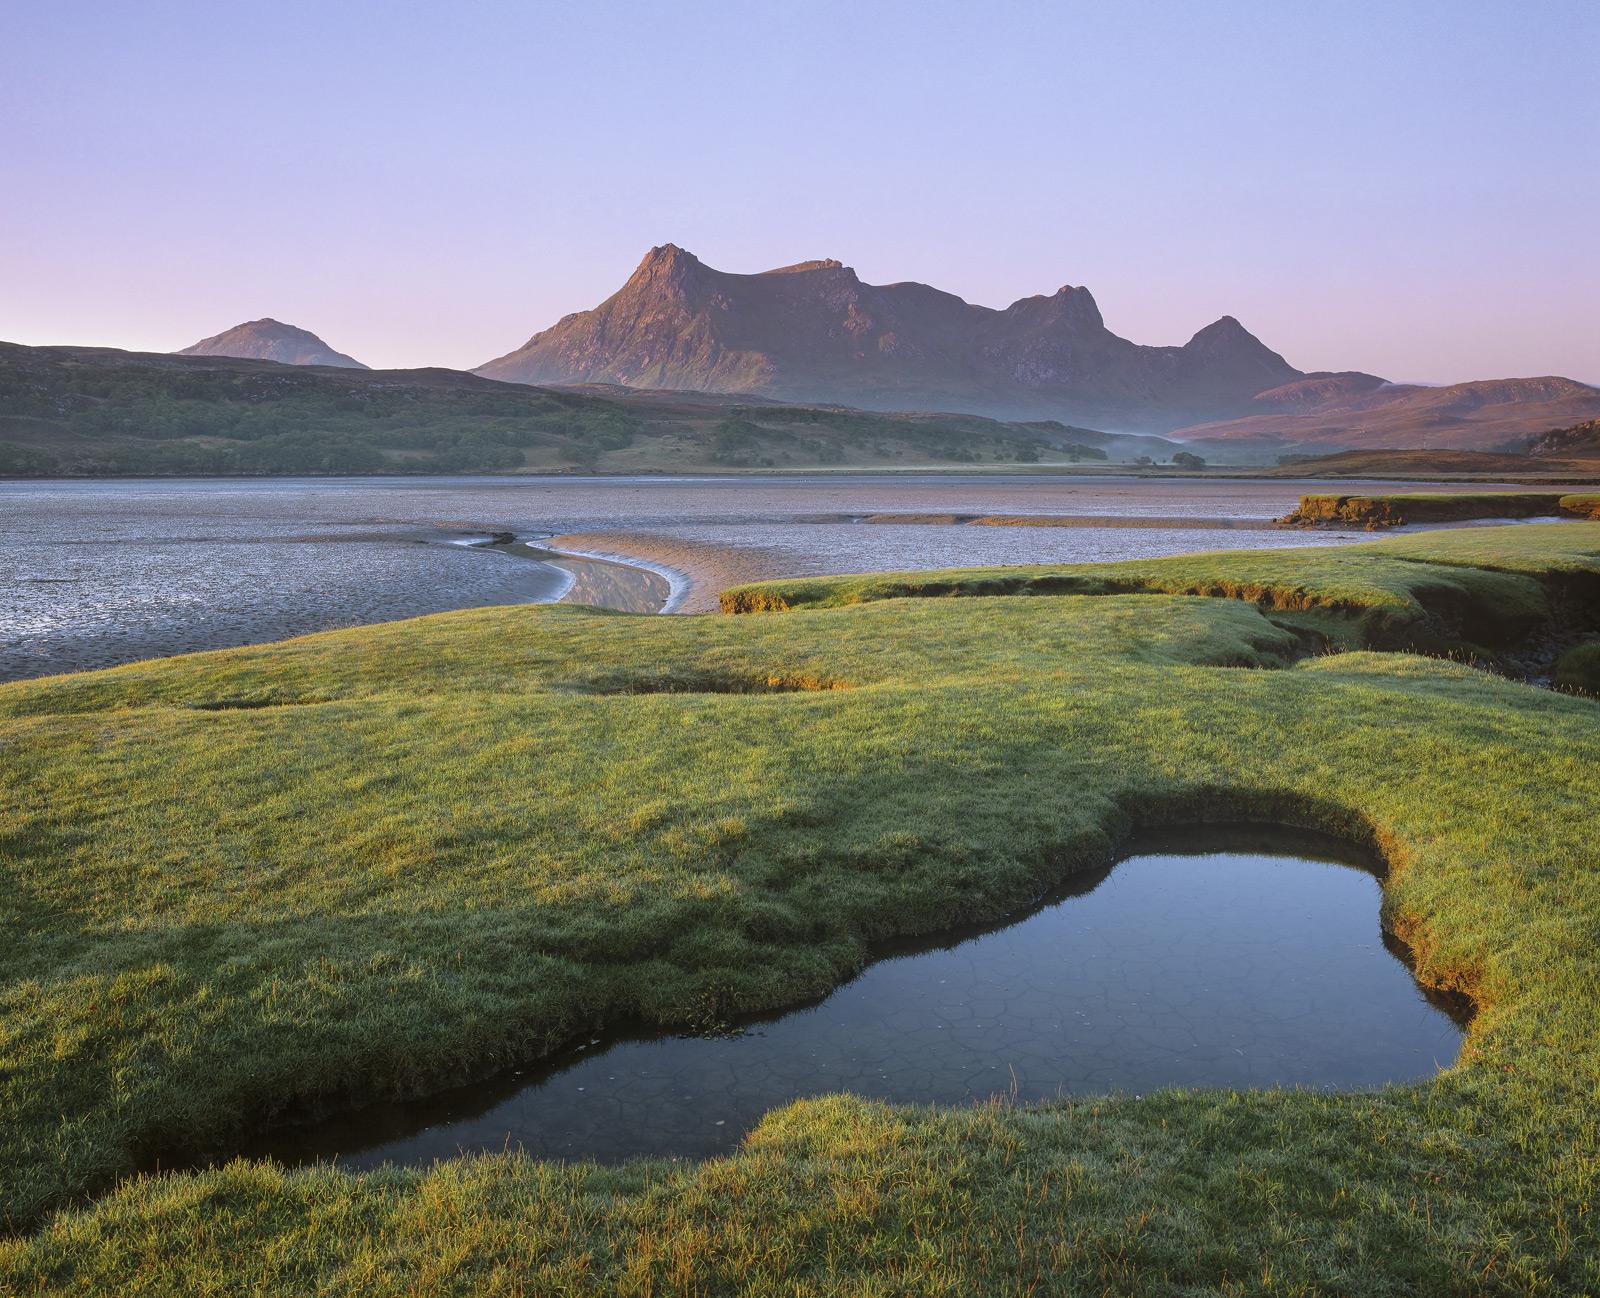 Misty Sunrise Tongue, Tongue, Sutherland, Scotland, estuary, tidal, Ben Loyal, rocky, serated, peaks, salt marshes, sunr, photo